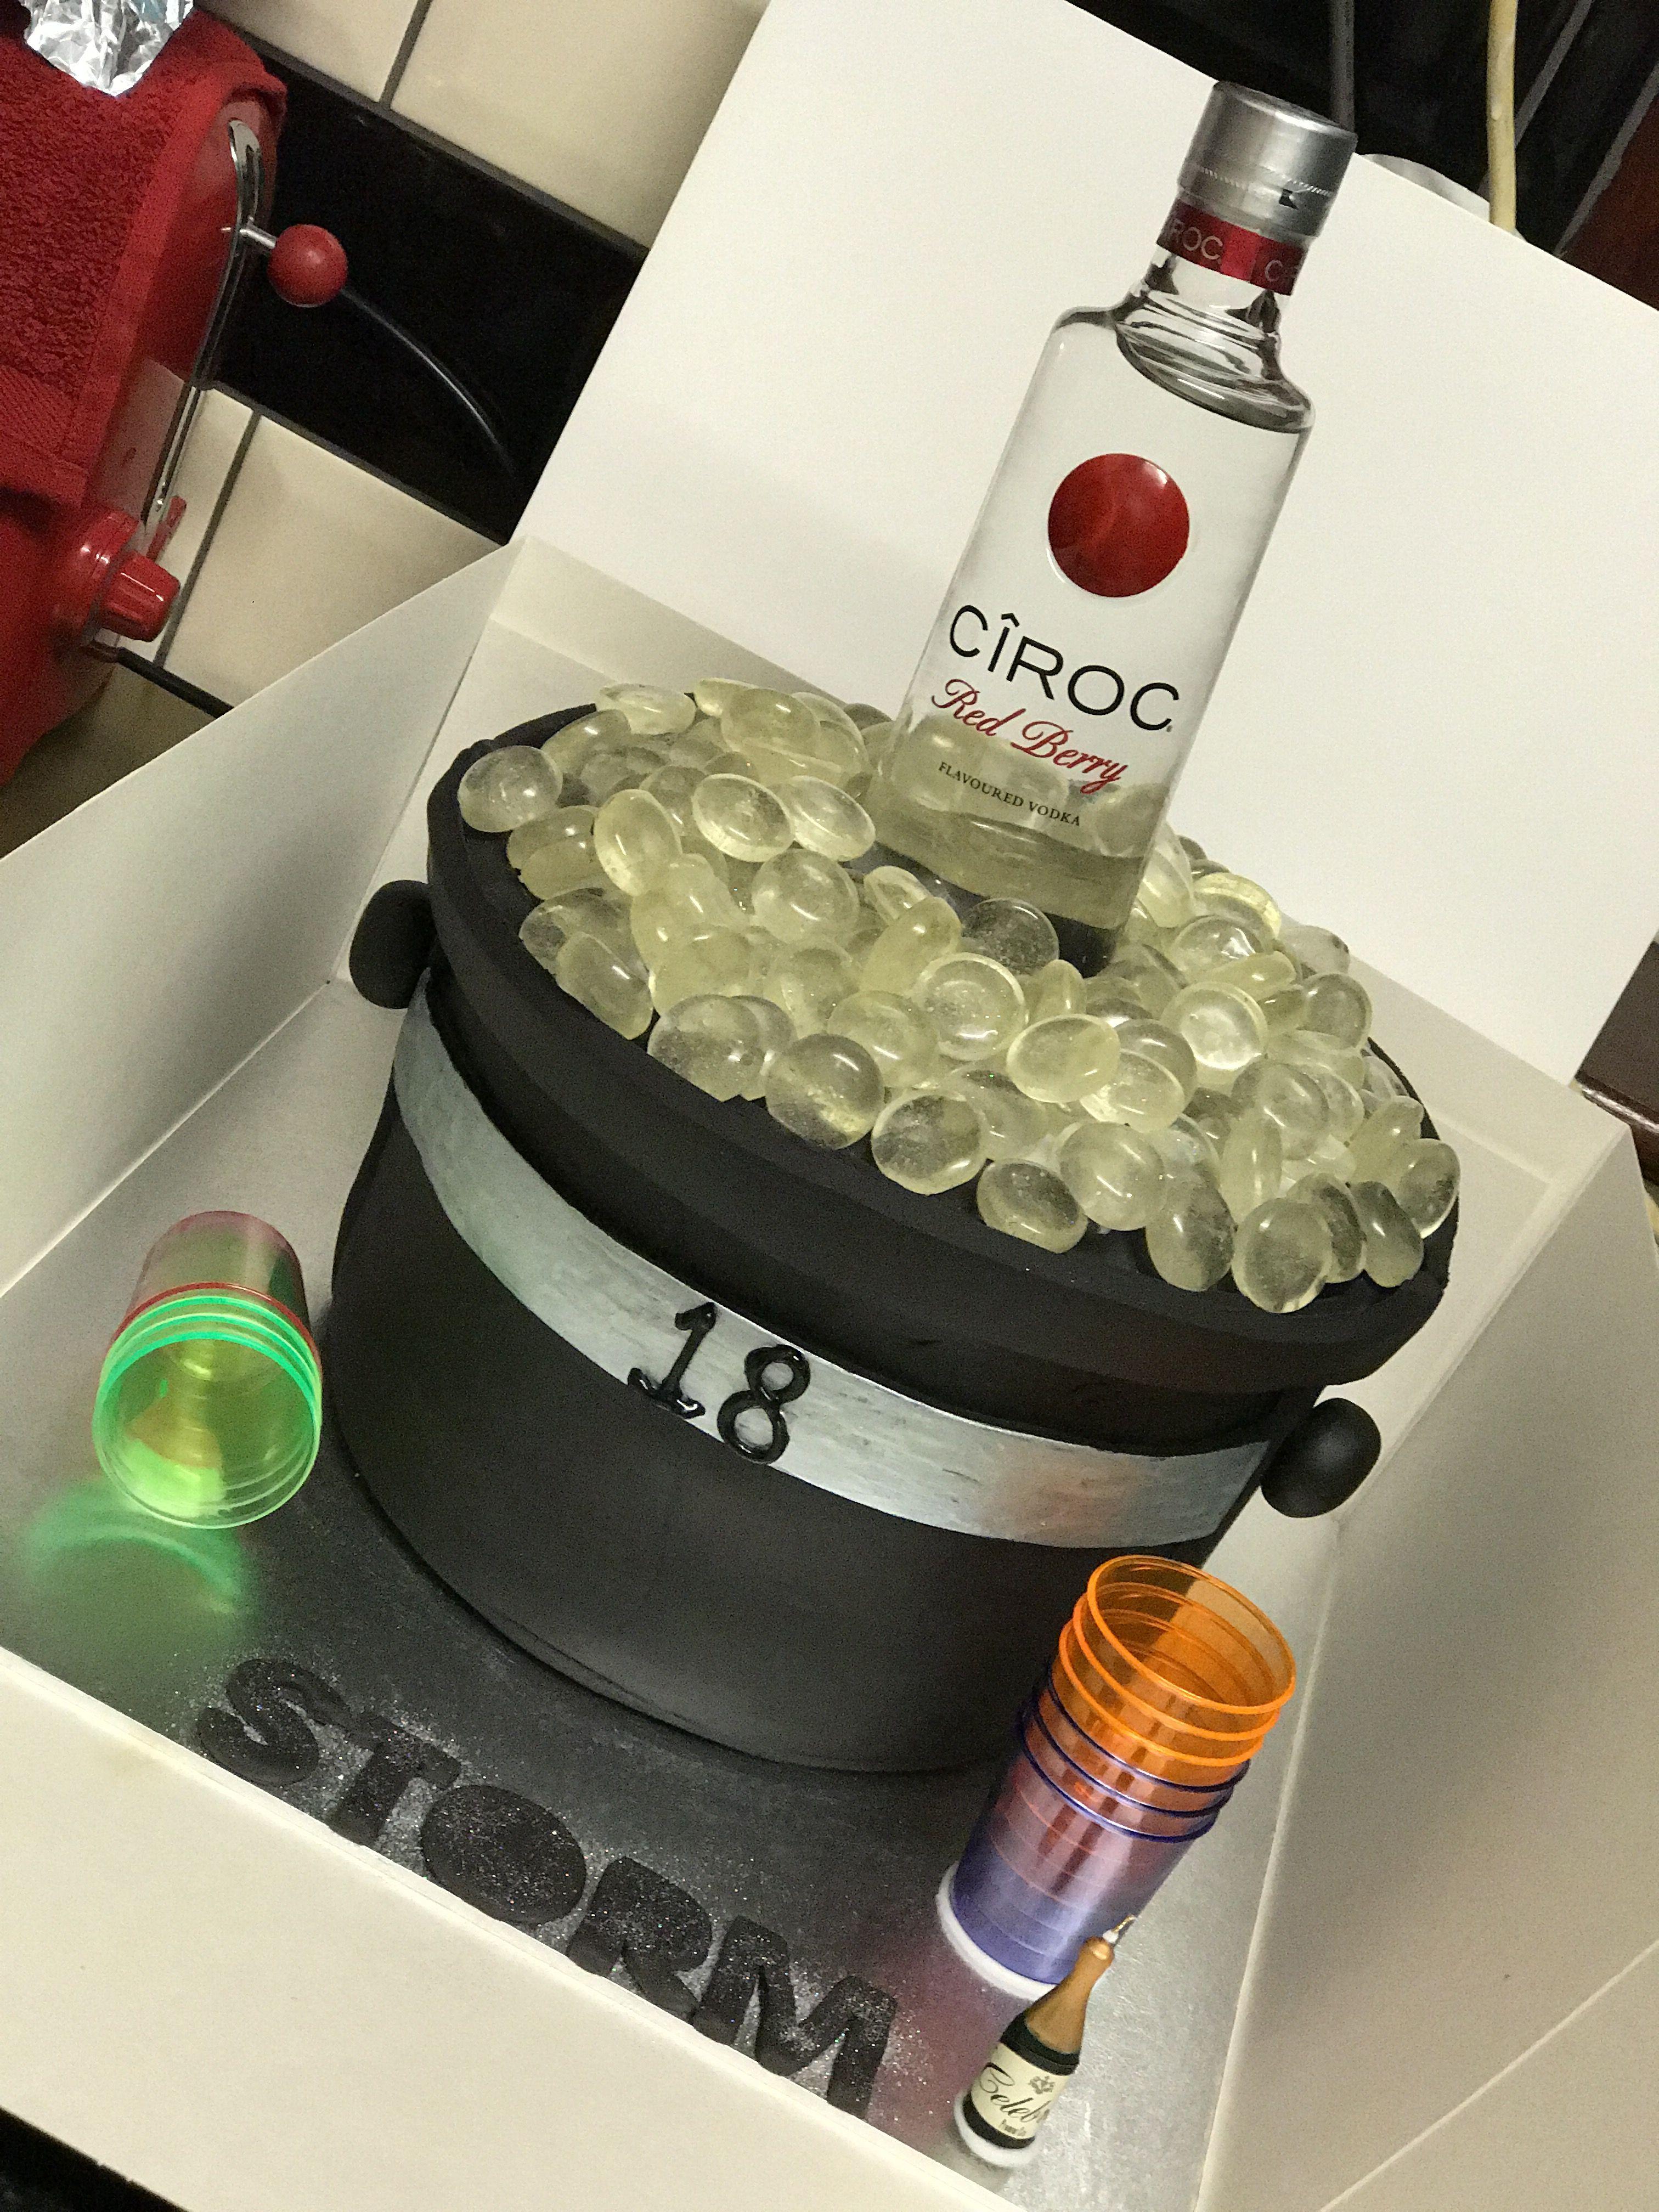 Pleasant Ciroc Cake In A Bucket Of Ice Cake Designs Birthday Cake Funny Birthday Cards Online Alyptdamsfinfo